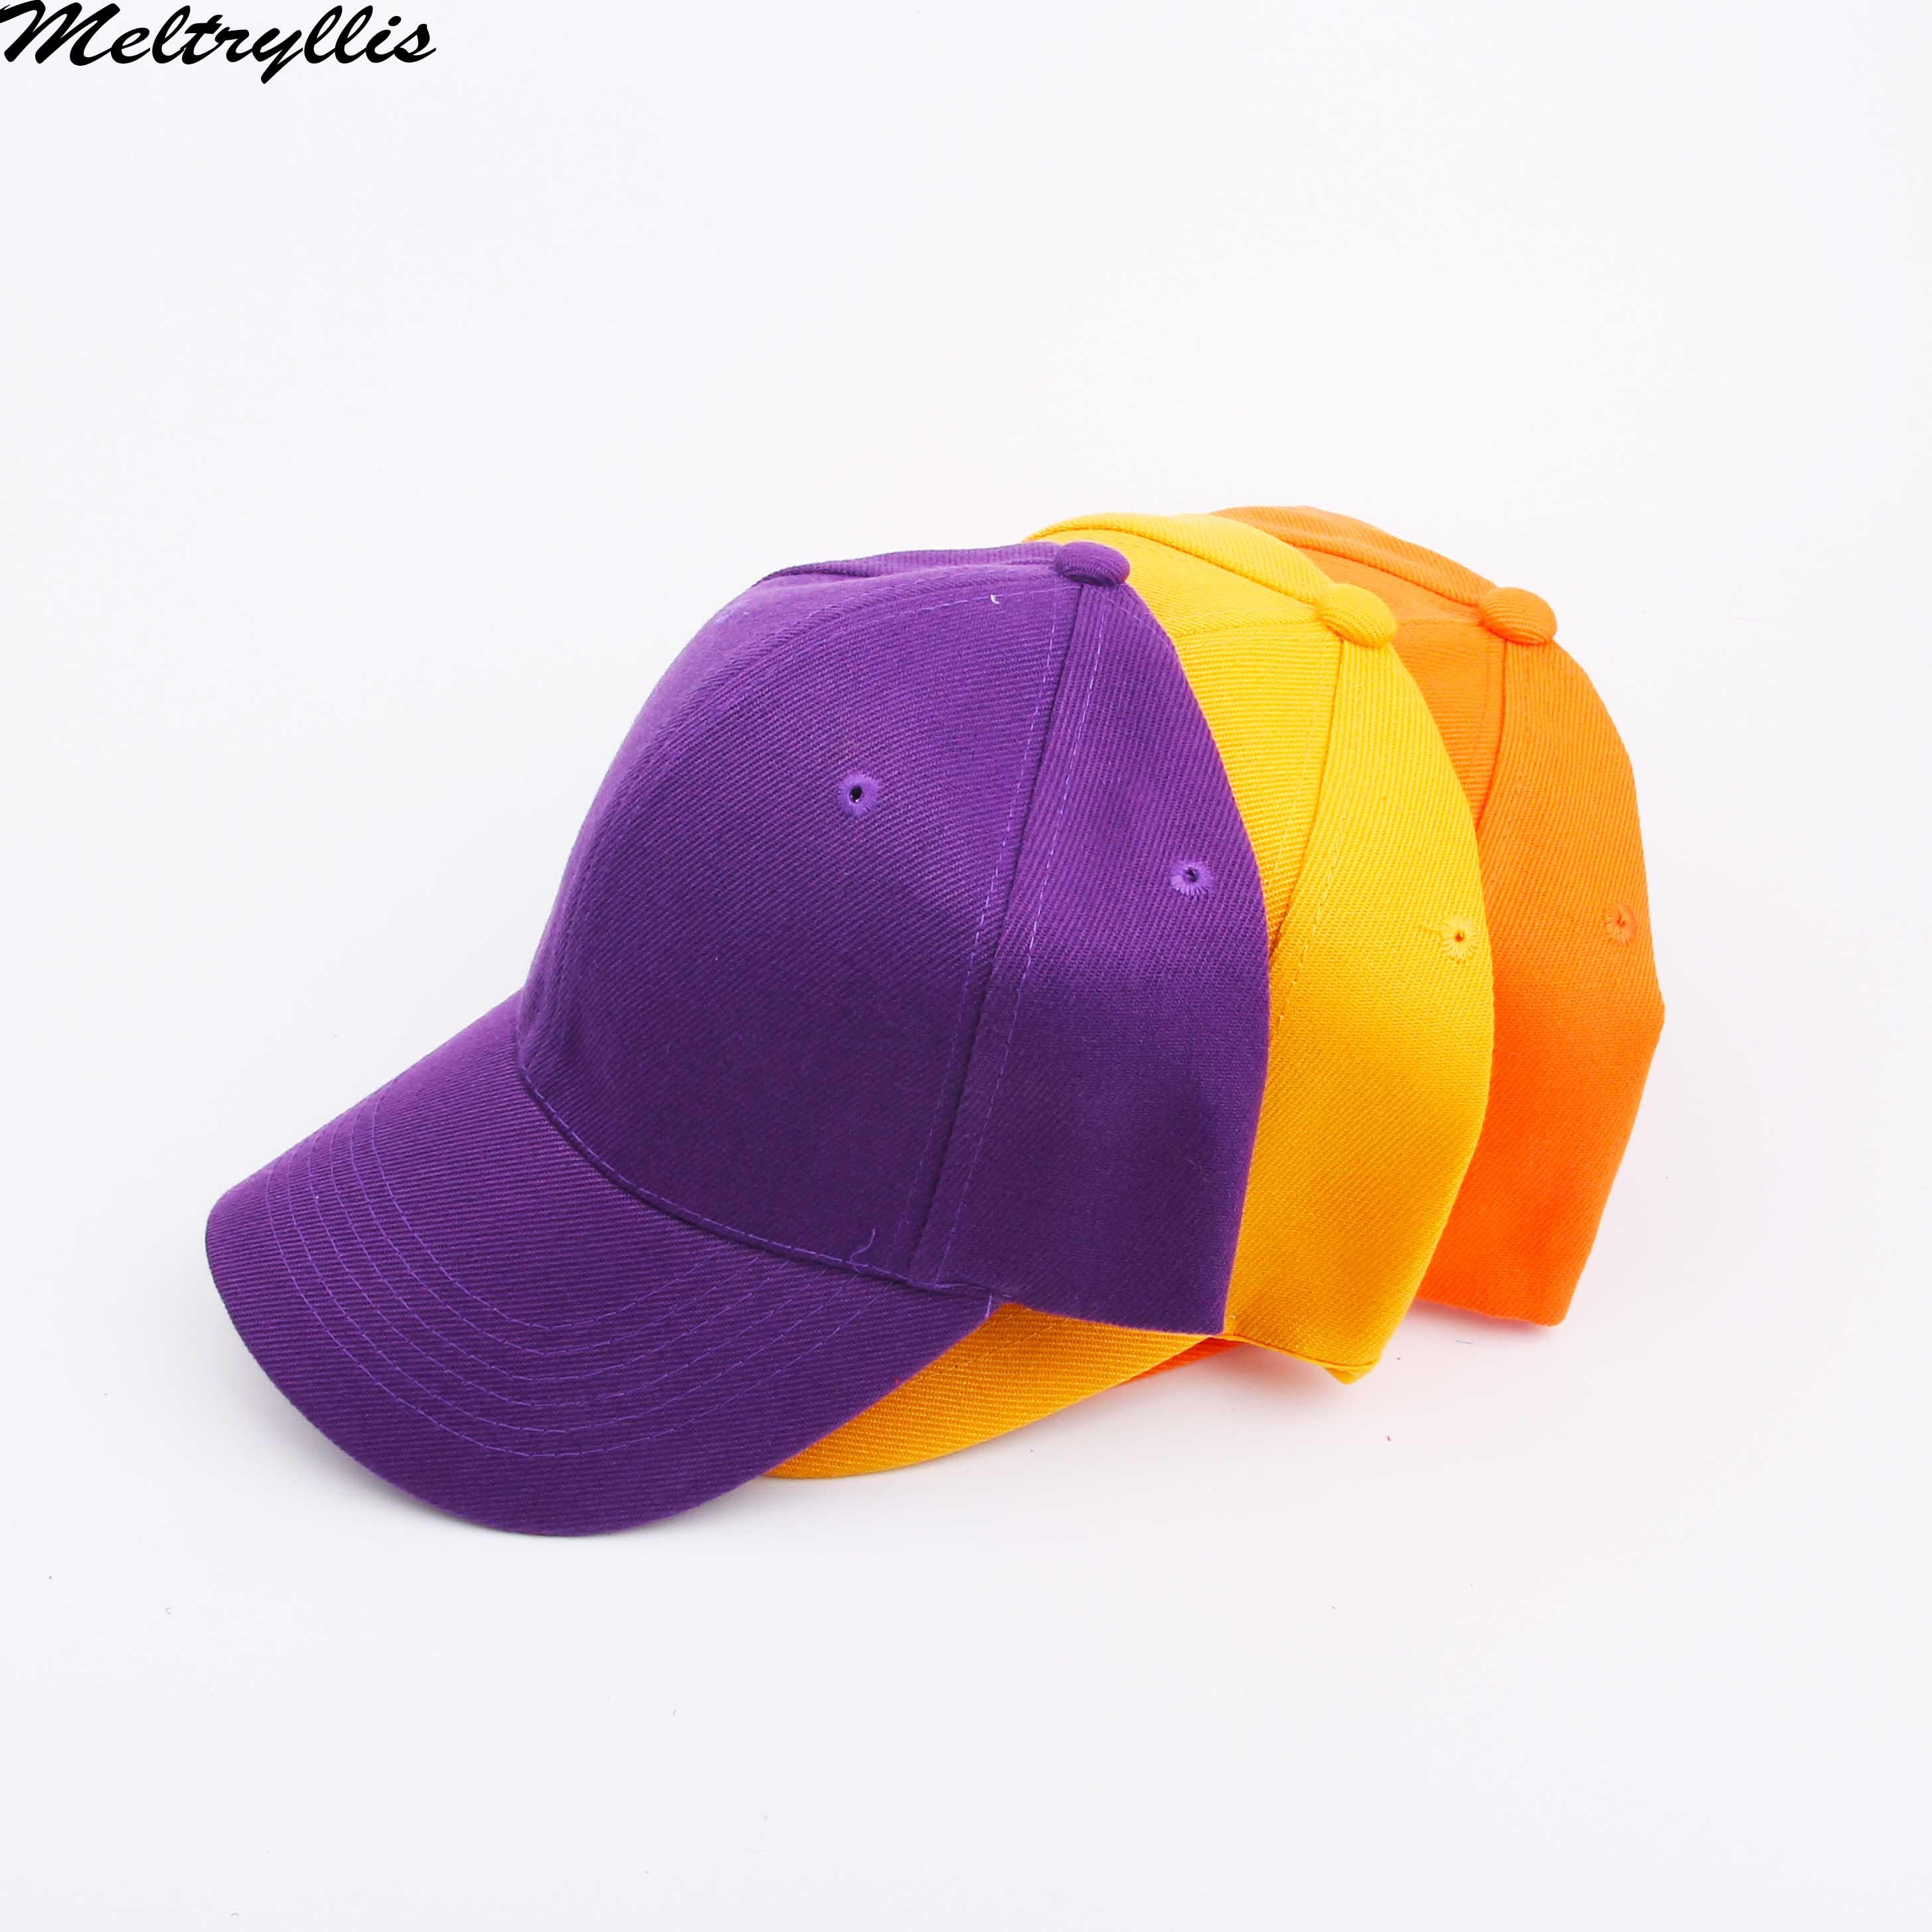 [Meltryllis] Curved Sun Visor Light Board Solid Color Orange Yellow Purple Baseball Cap Men Women Fahsion Outdoor Sport Hat